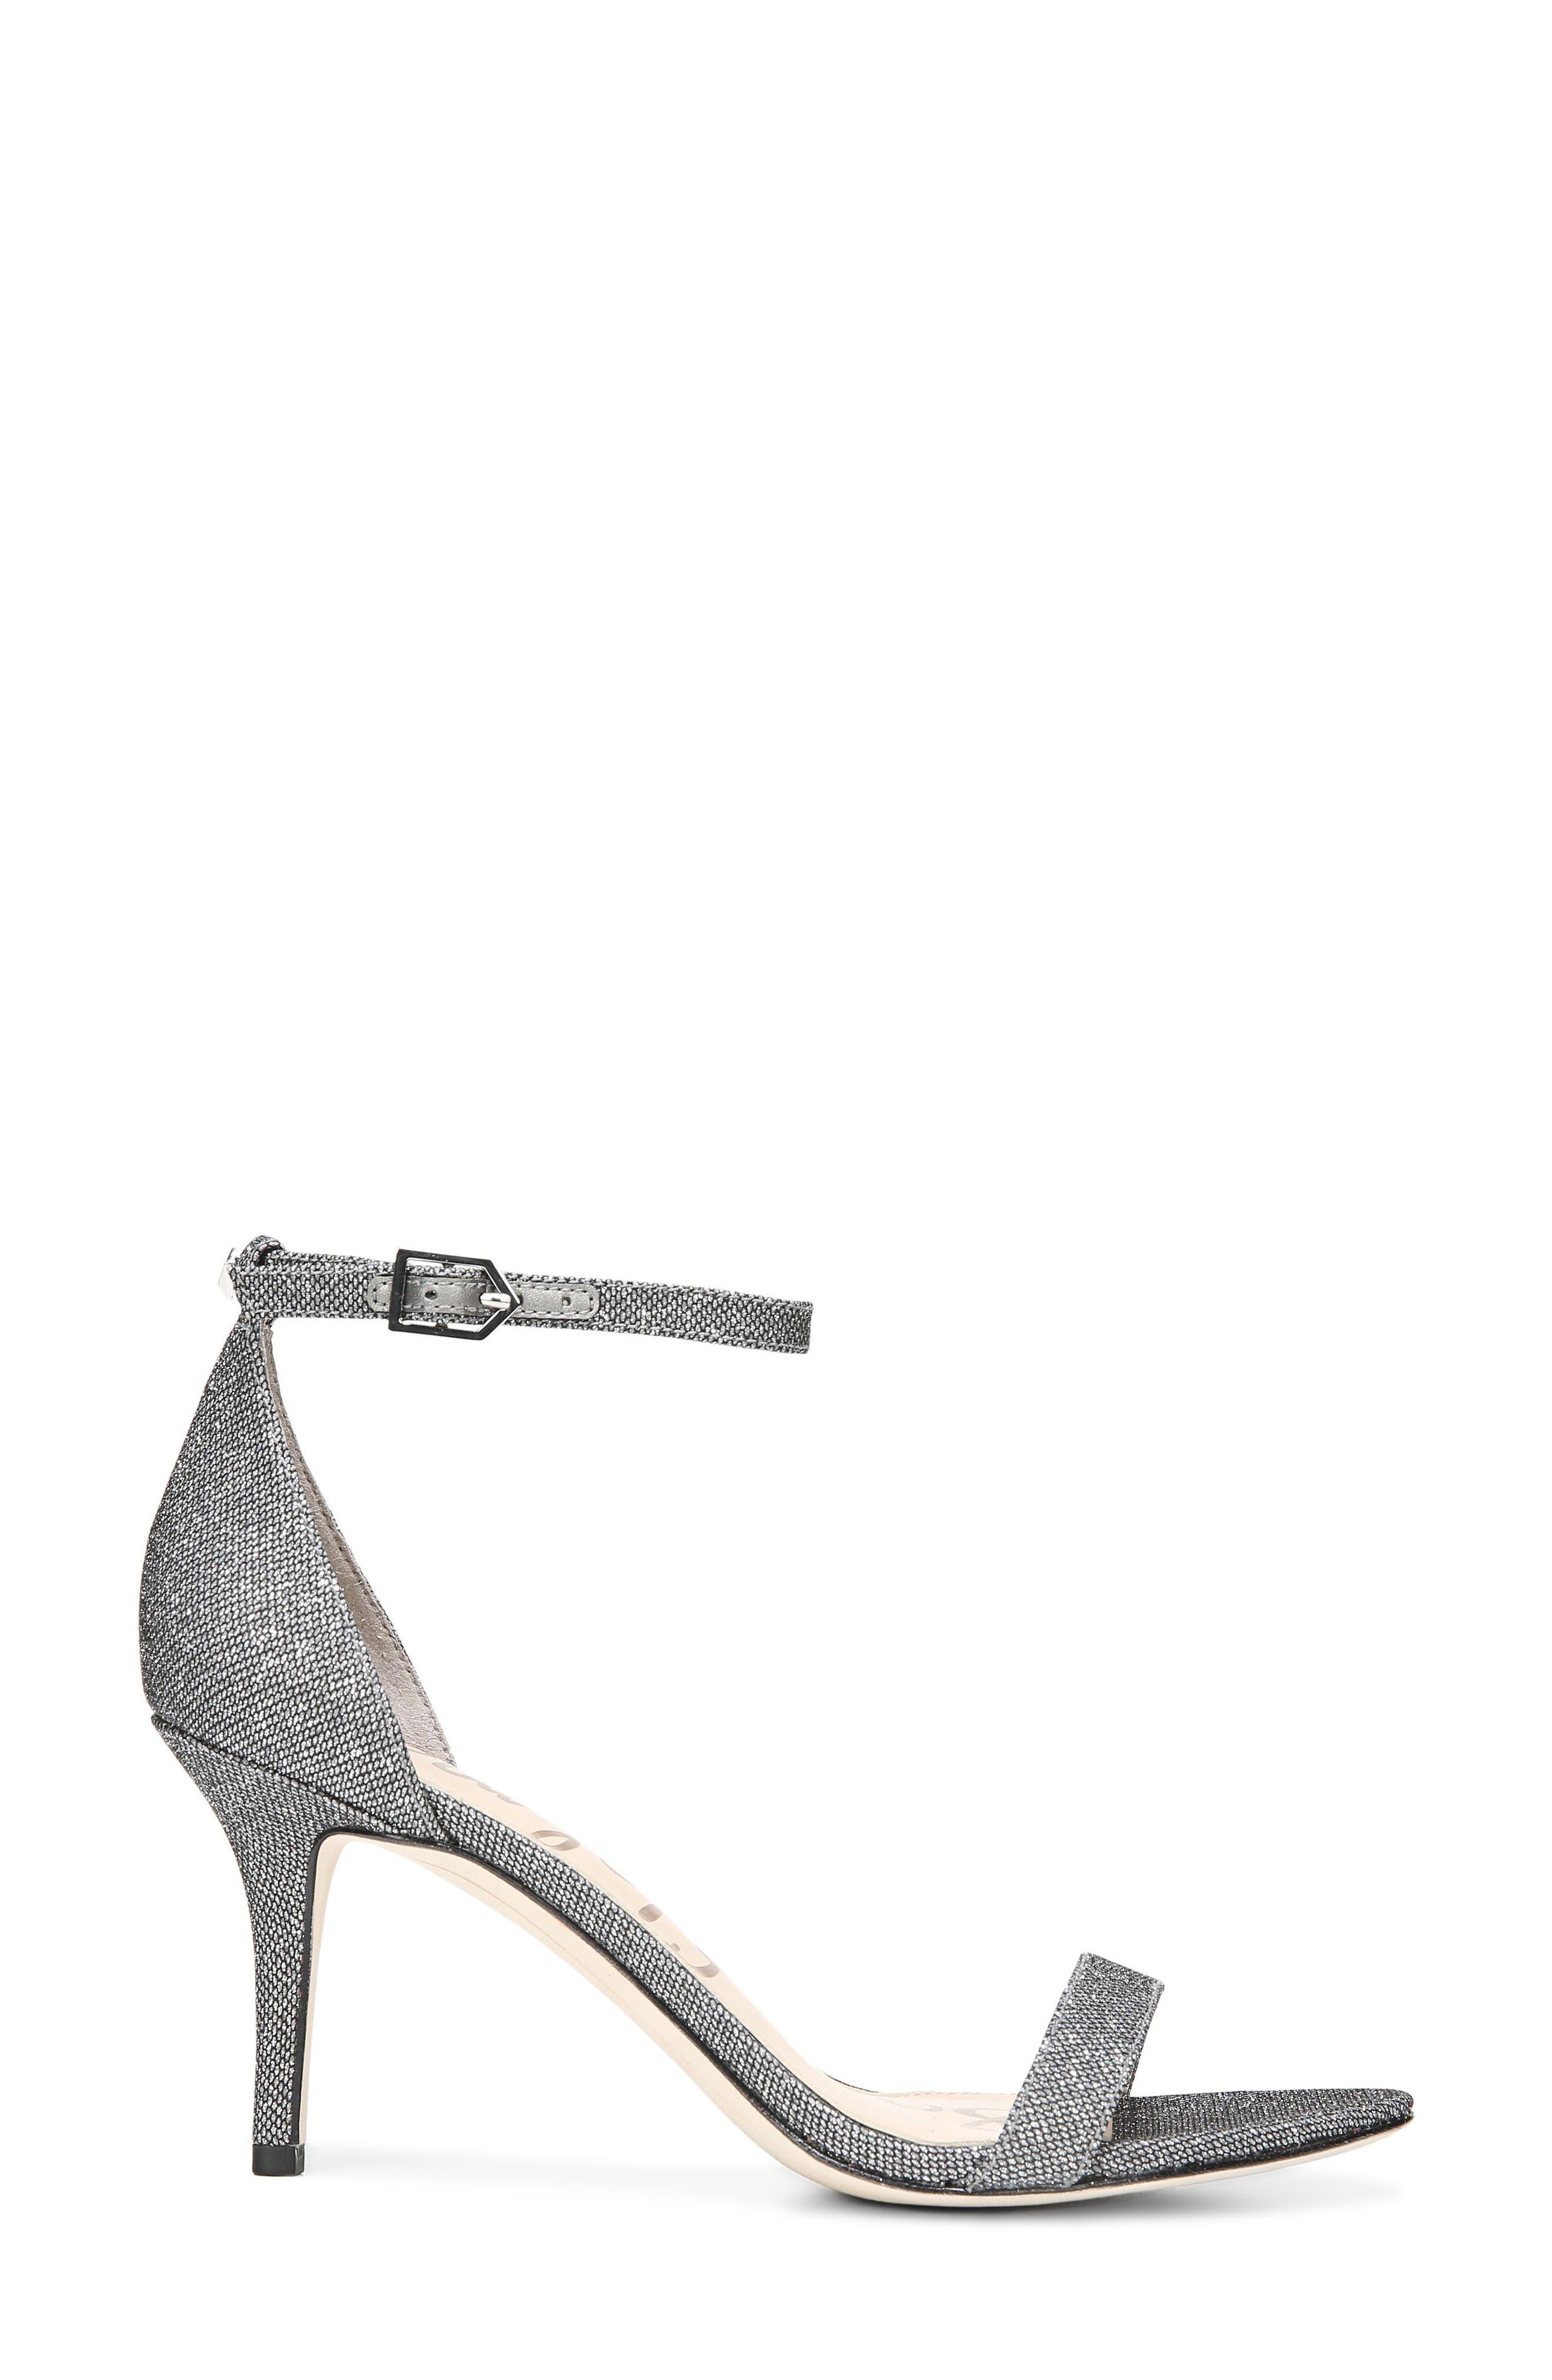 Patti Ankle Strap Sandal,                             Alternate thumbnail 3, color,                             Pewter Fabric